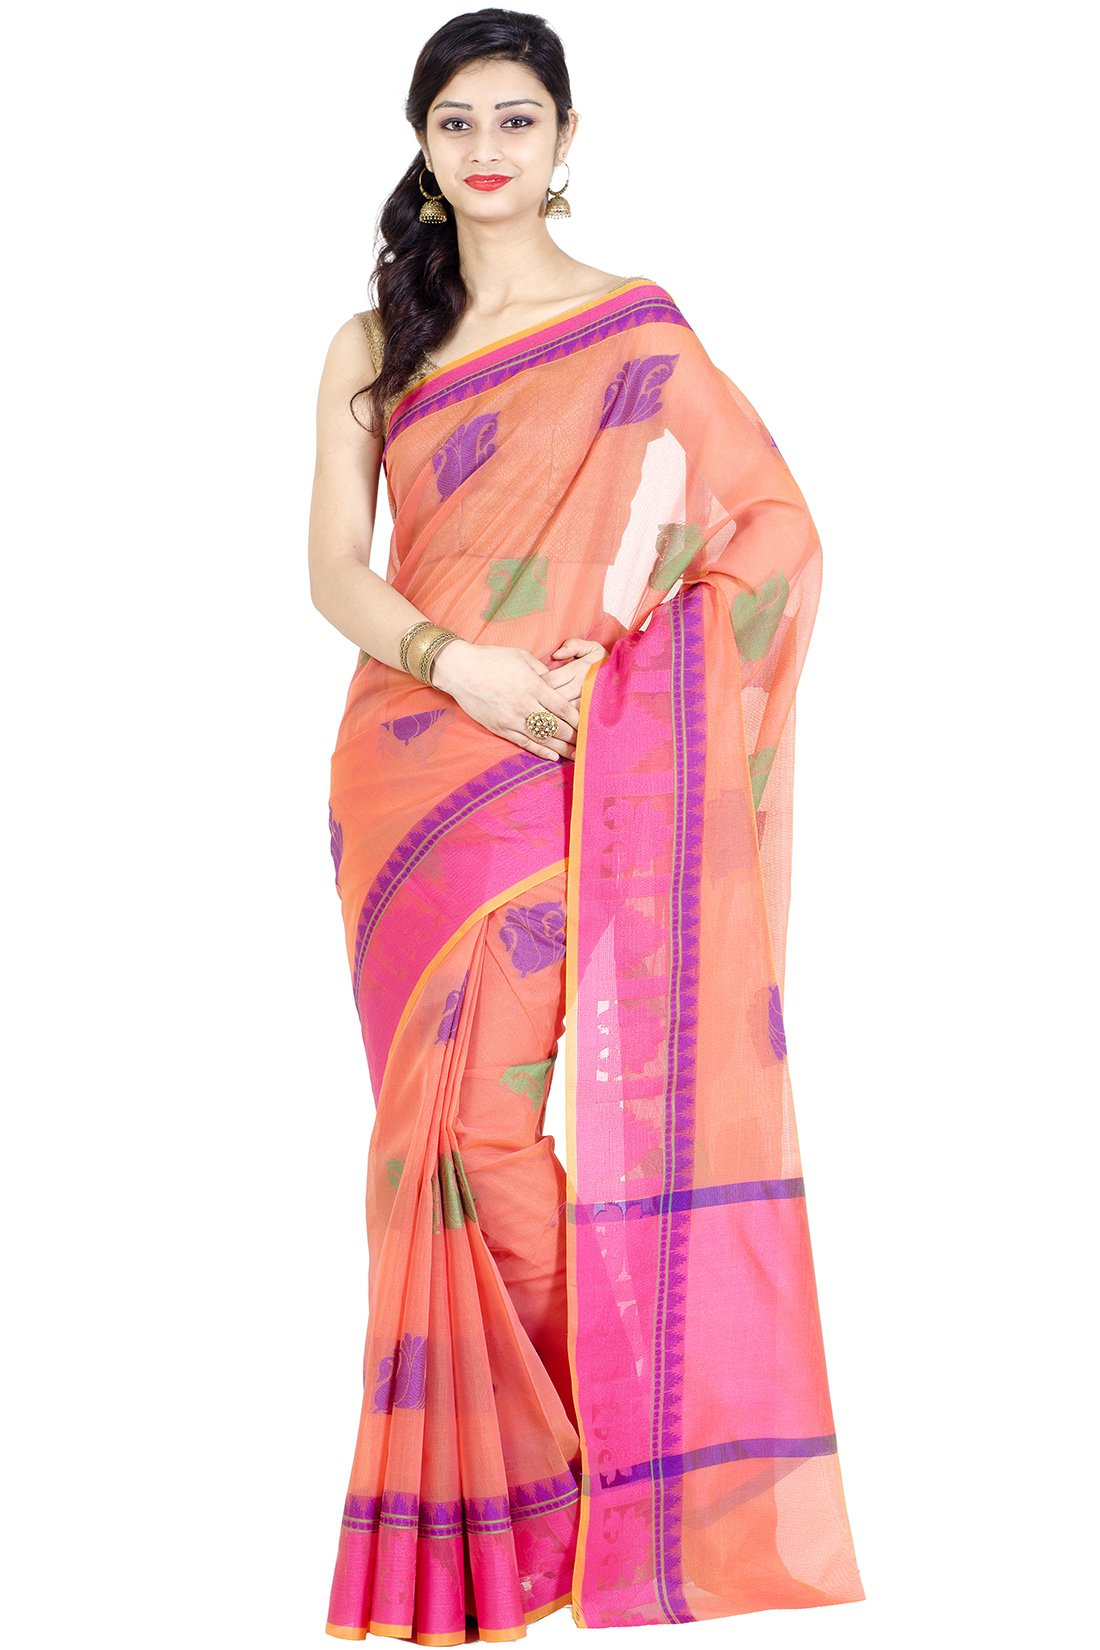 Chandrakala Women's Peach Banarasi Cotton Blend Saree